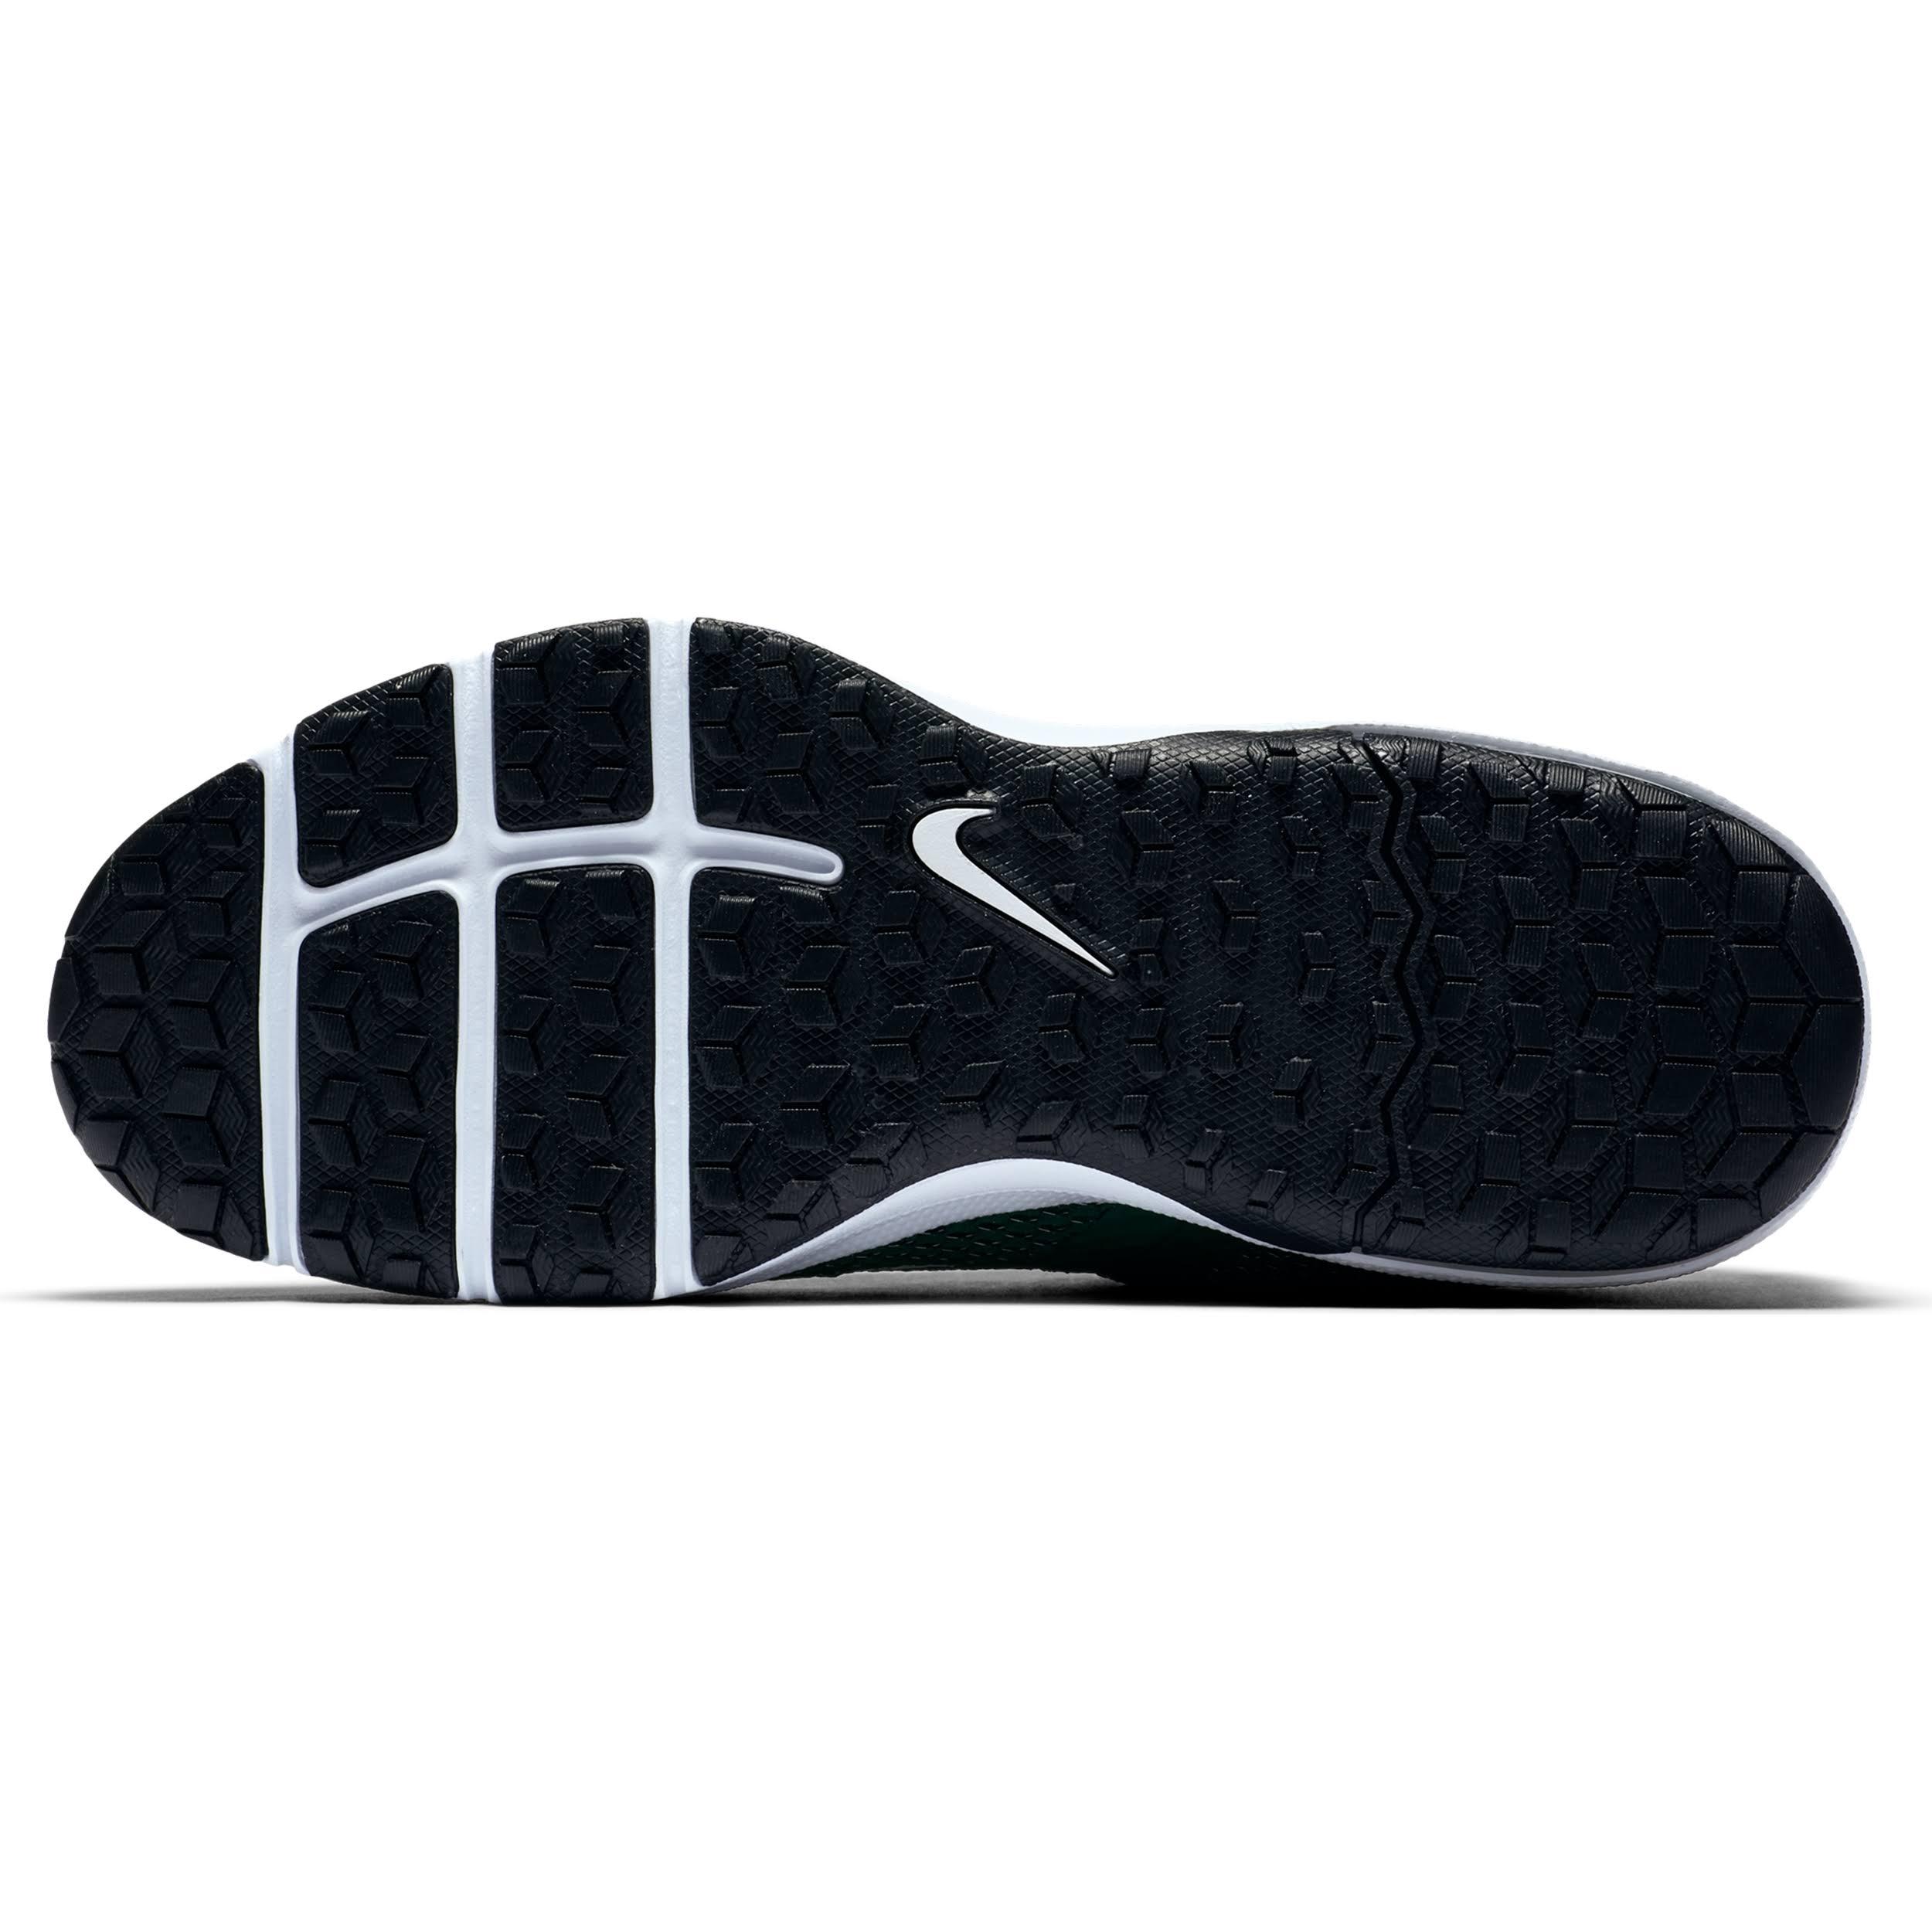 Typha 2 10 Trainingsschuhe 5 Grün Max Größe Nike Air Pqxfaa